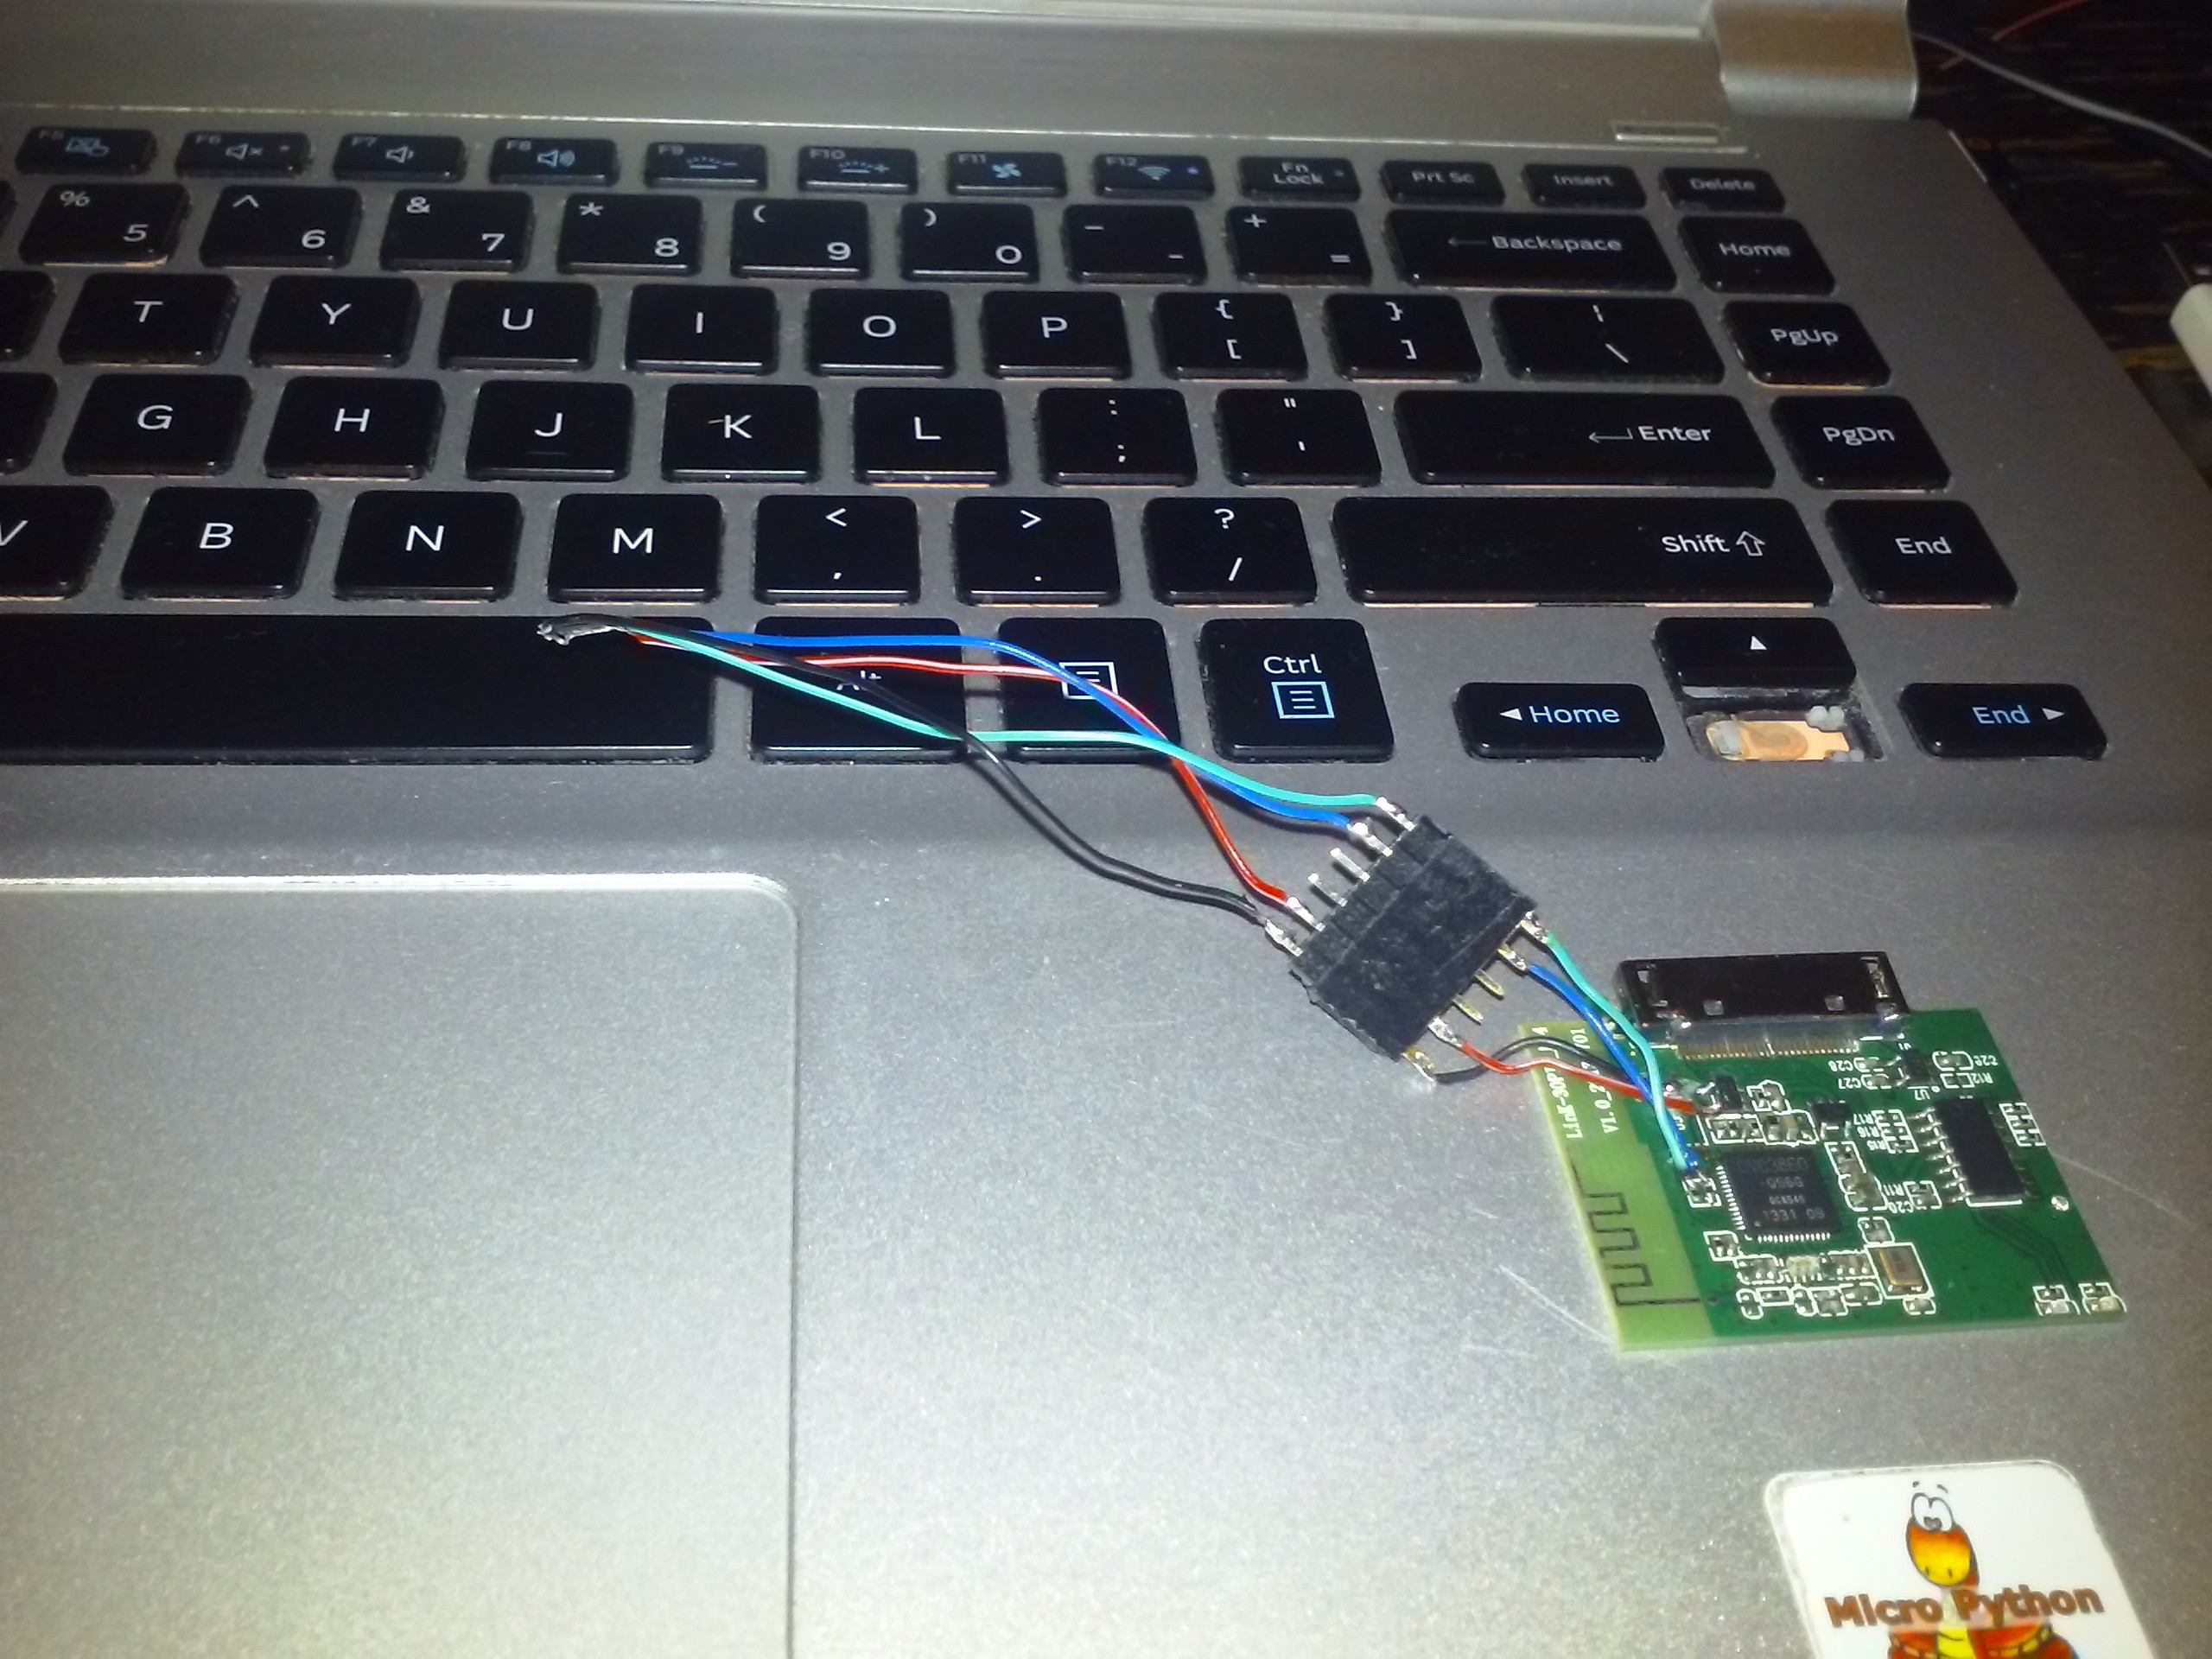 Reflashing I2C EEPROMs while hacking an OVC3860 Bluetooth